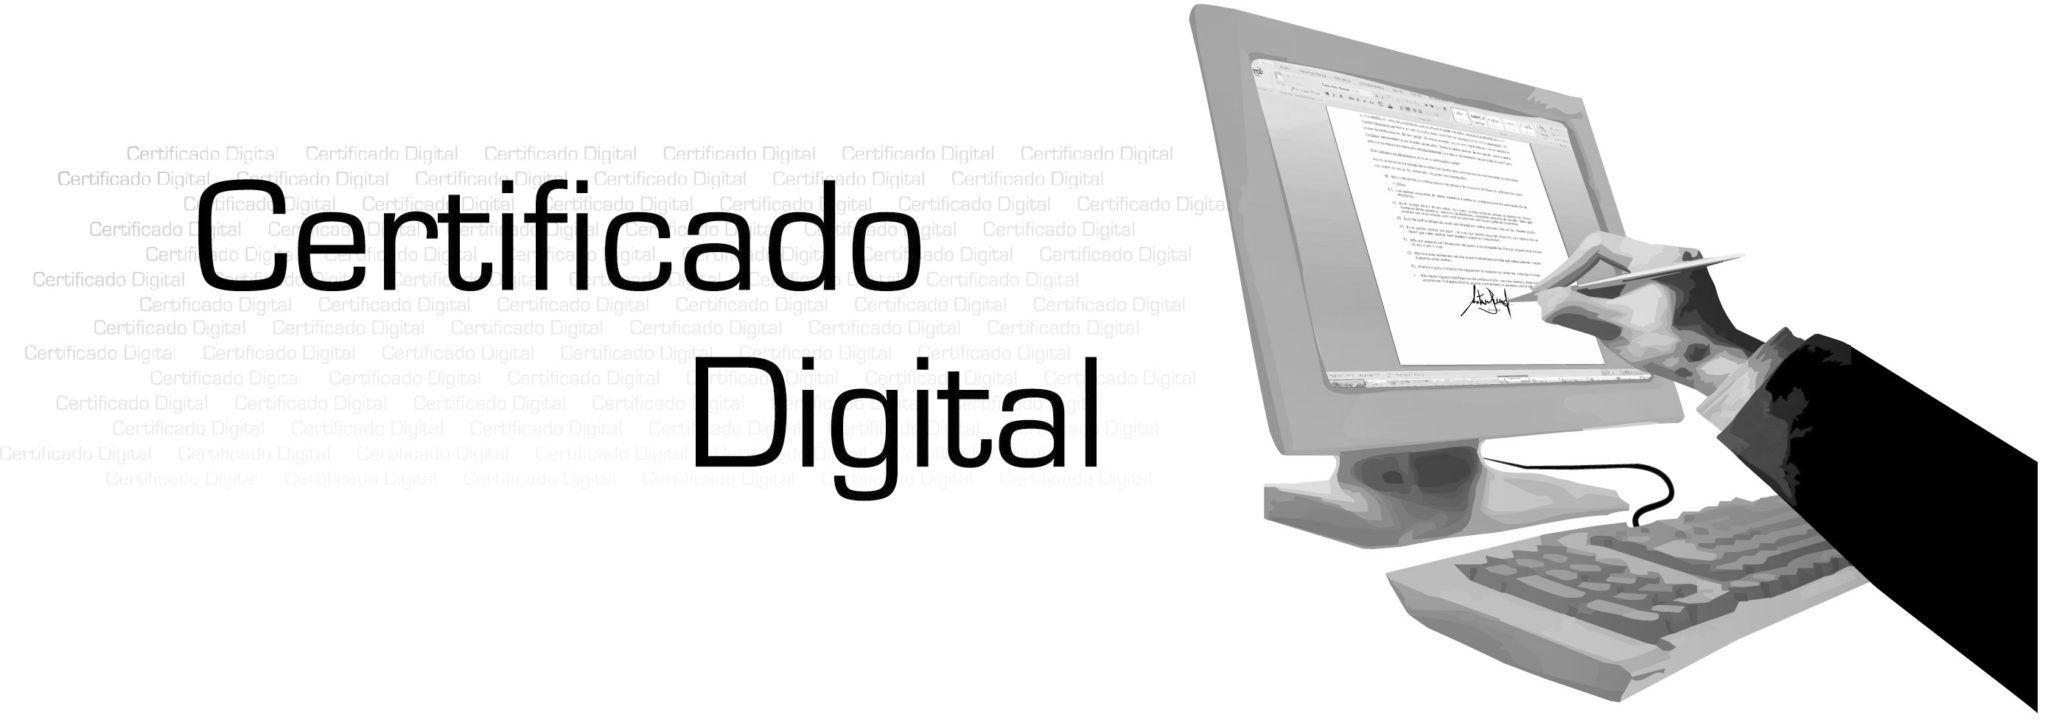 pedir e instalar certificado digital